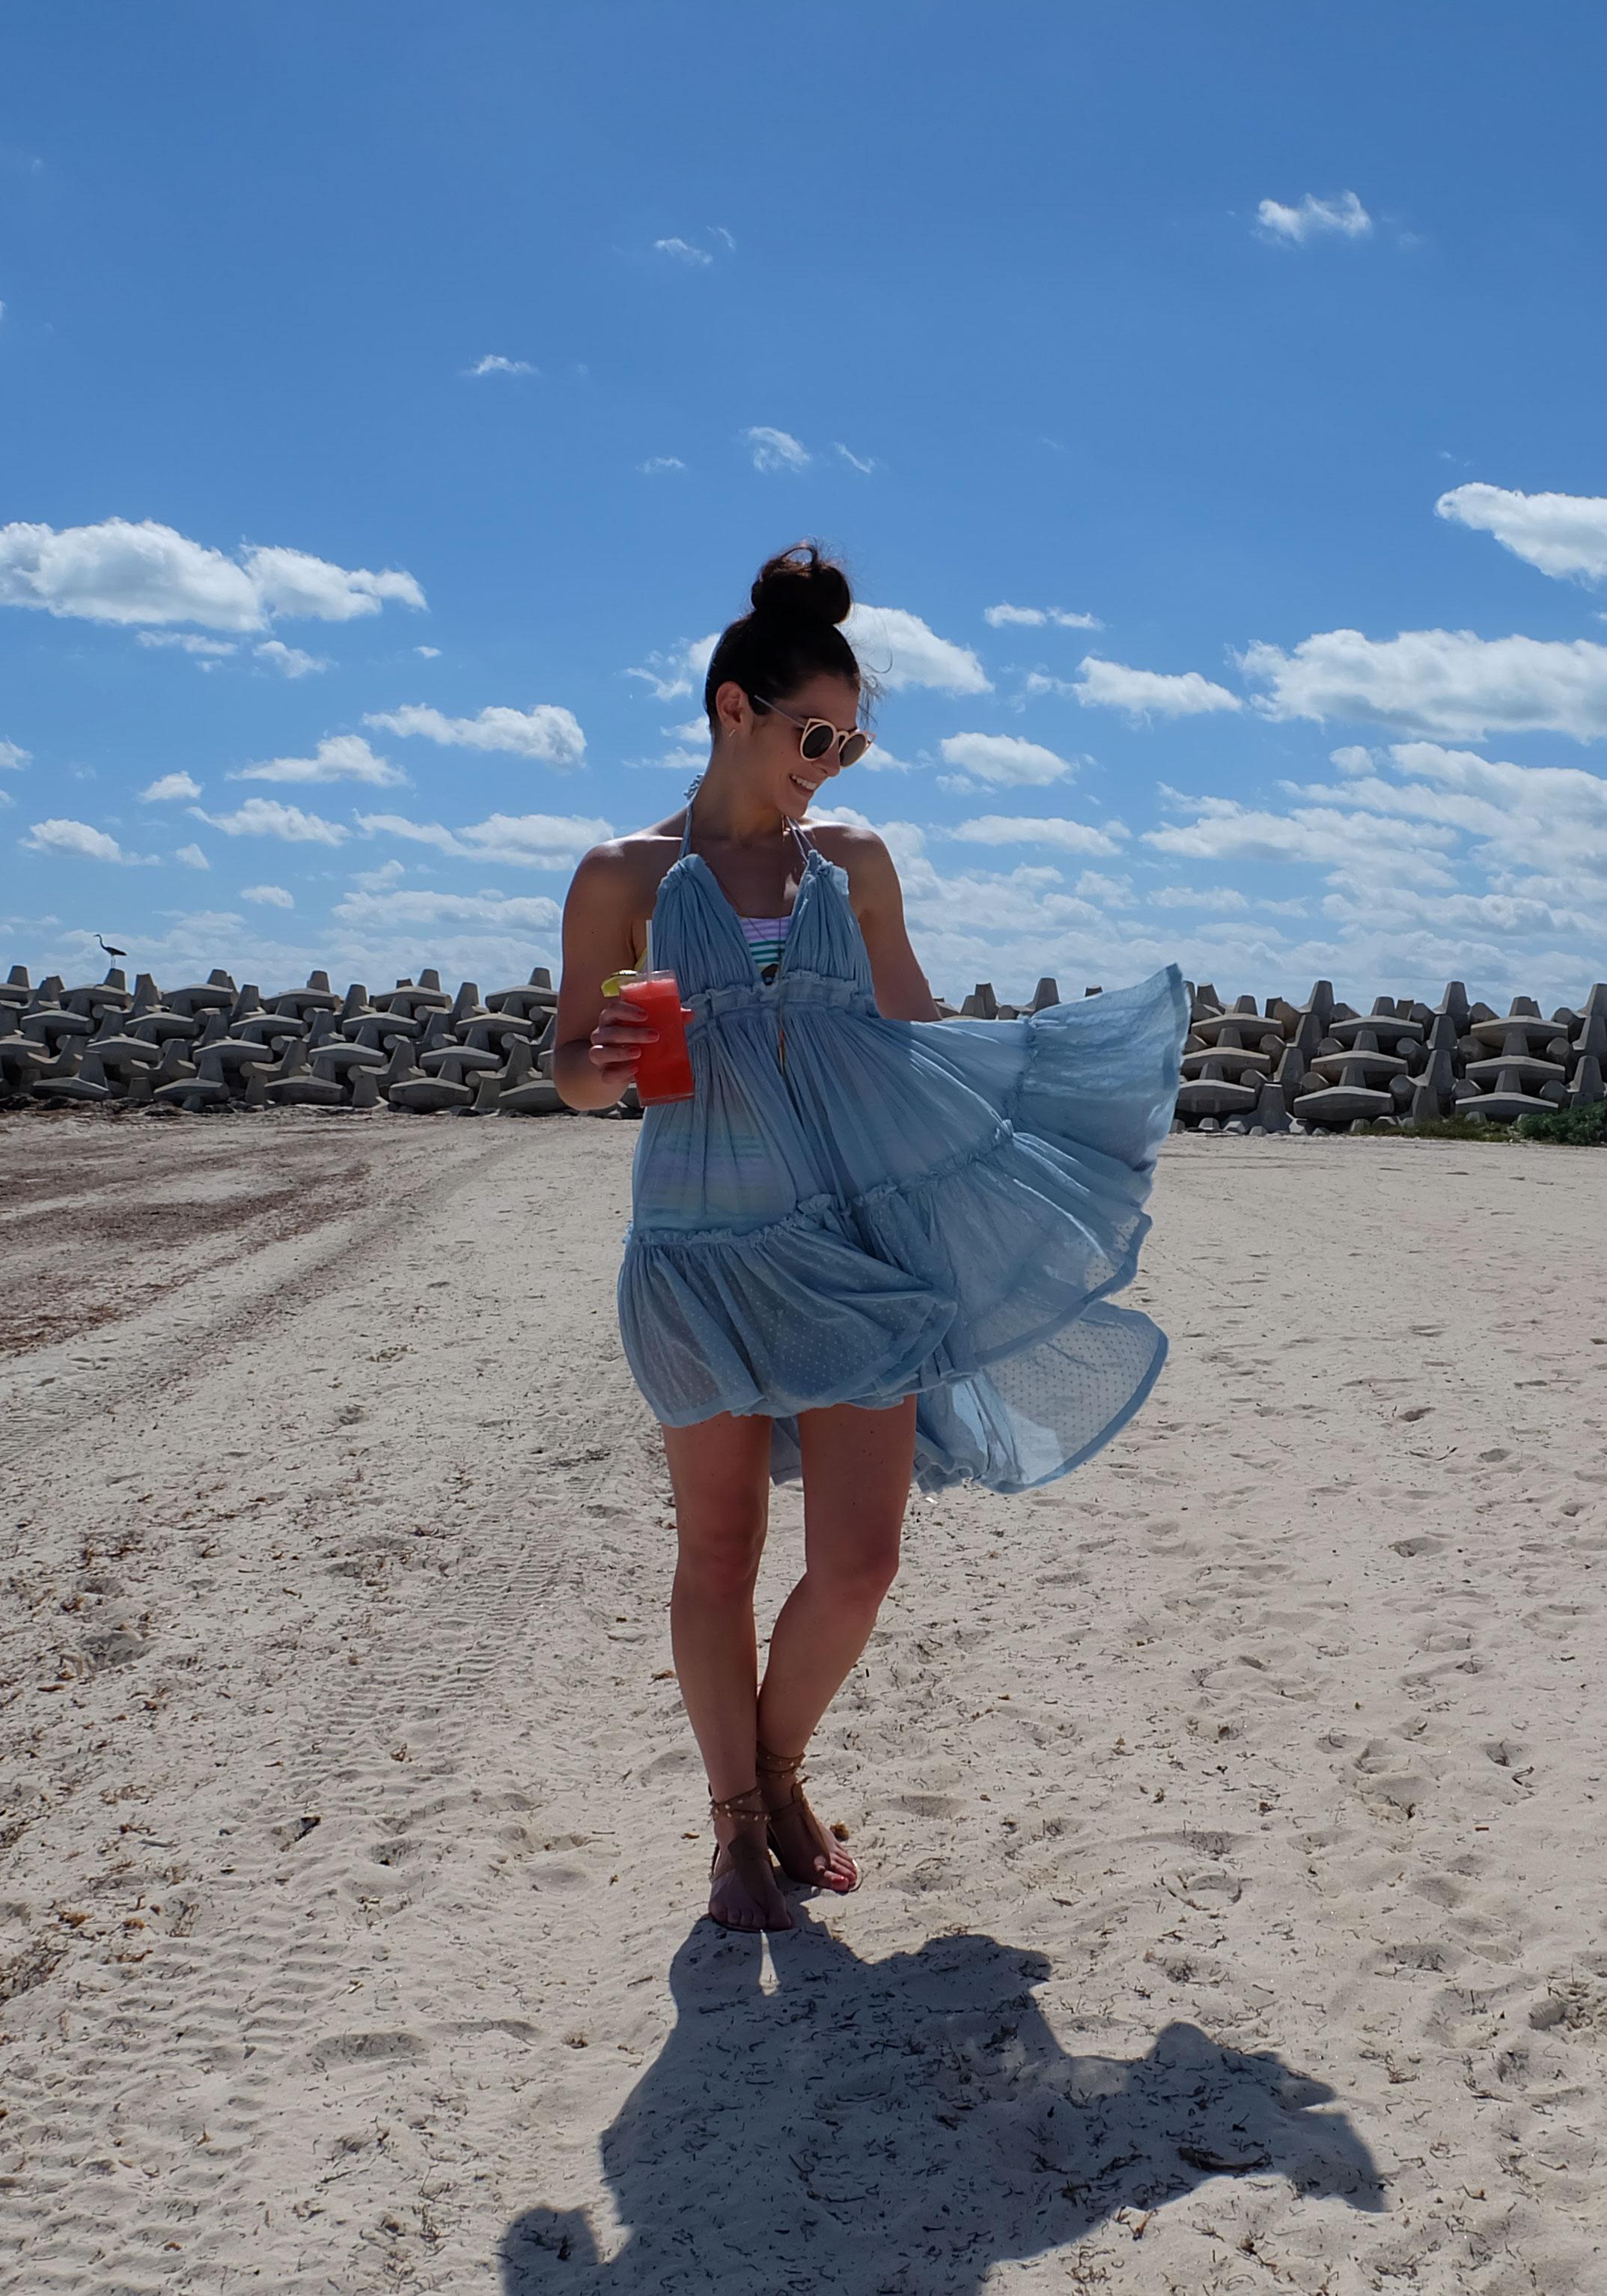 Vacation Outfit, Free People 100 Degree Dress, Aerie High-Rise Bikini Bottom & Bandeau Top, Sam Edelman Gigi Sandals, High Waisted Bikini